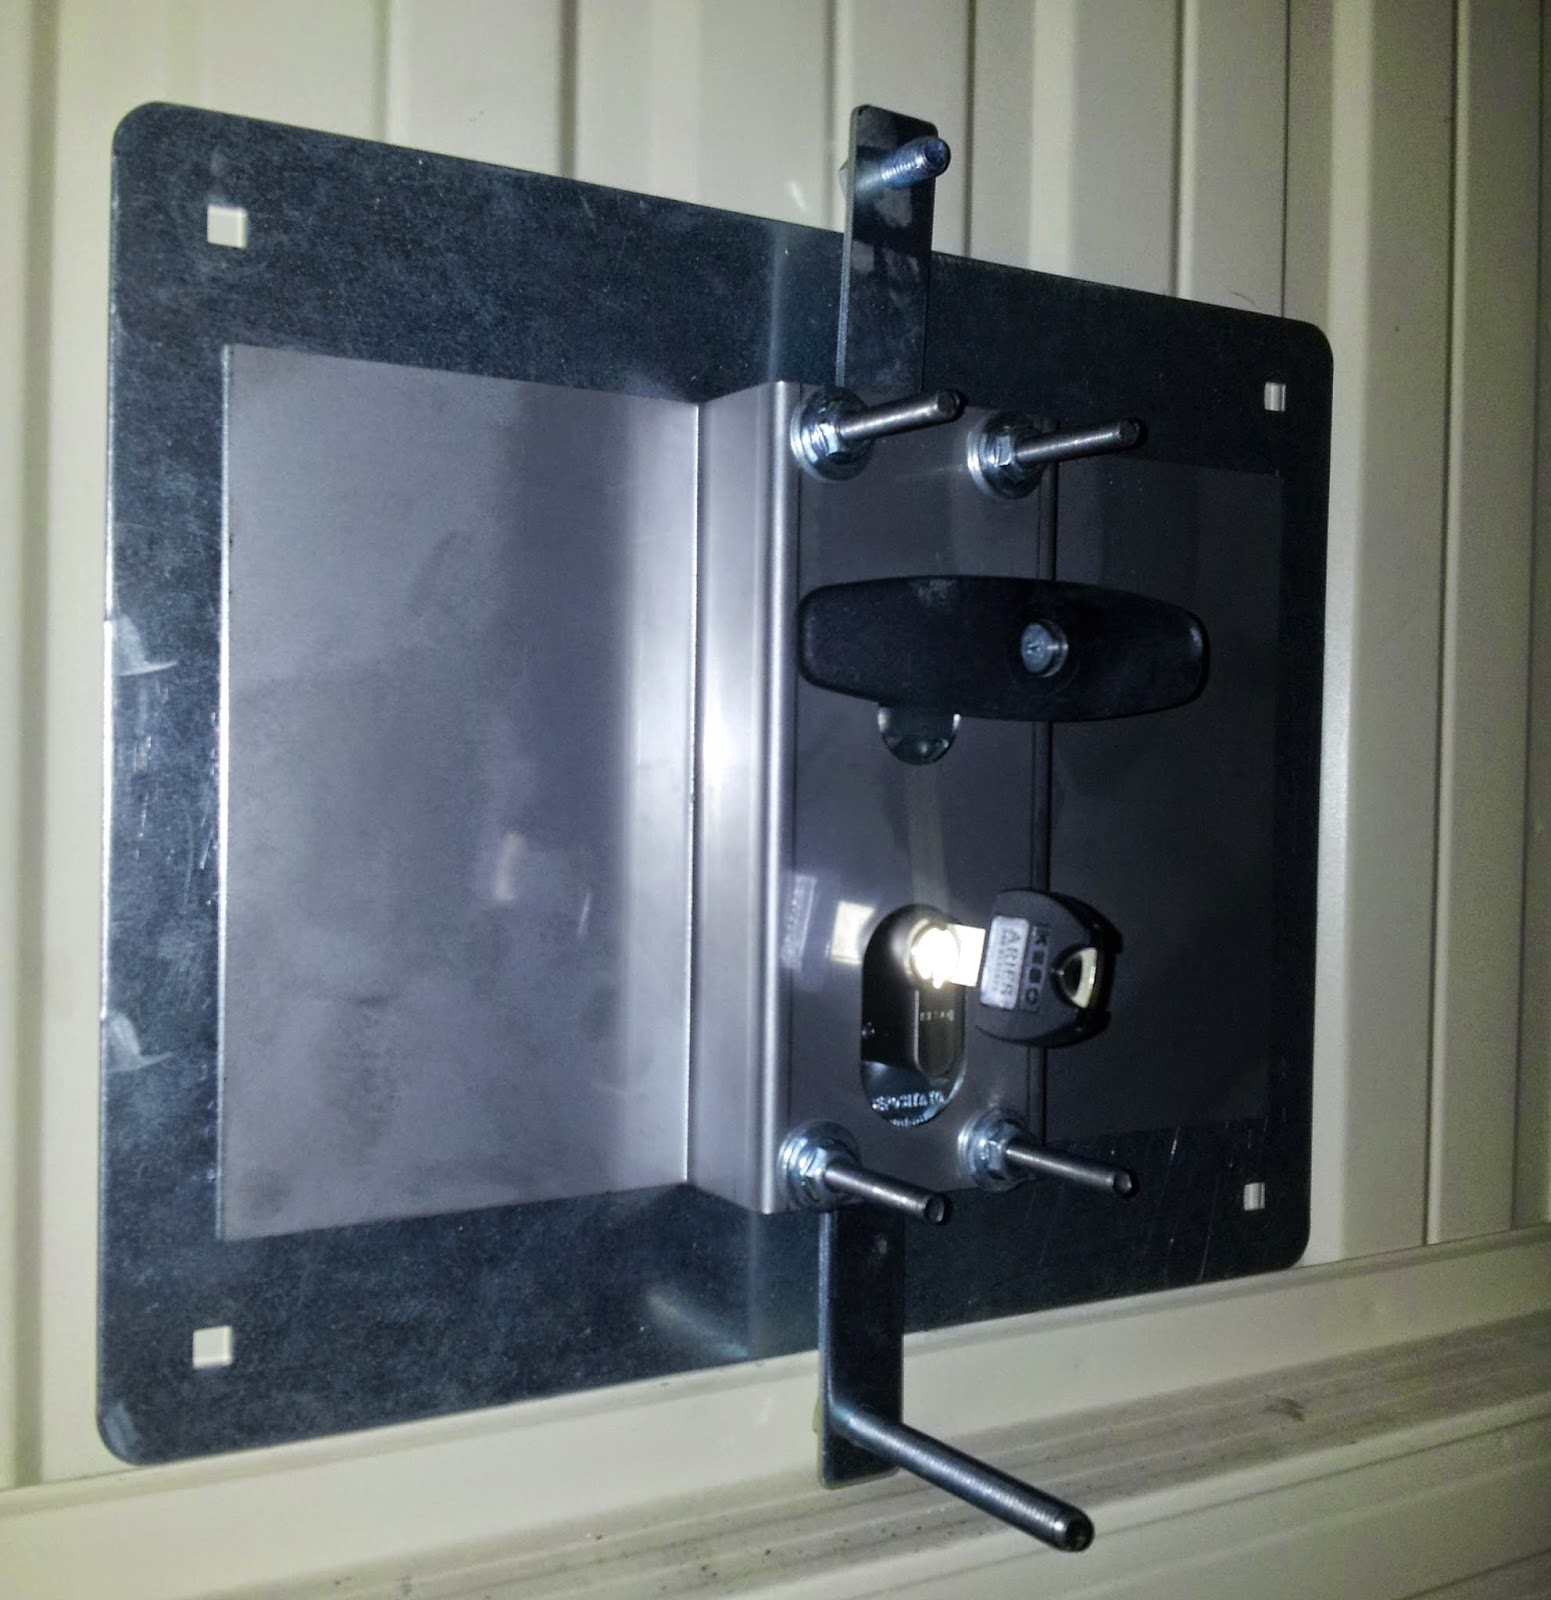 Fabbro Verona sostituzione serrature porte blindate